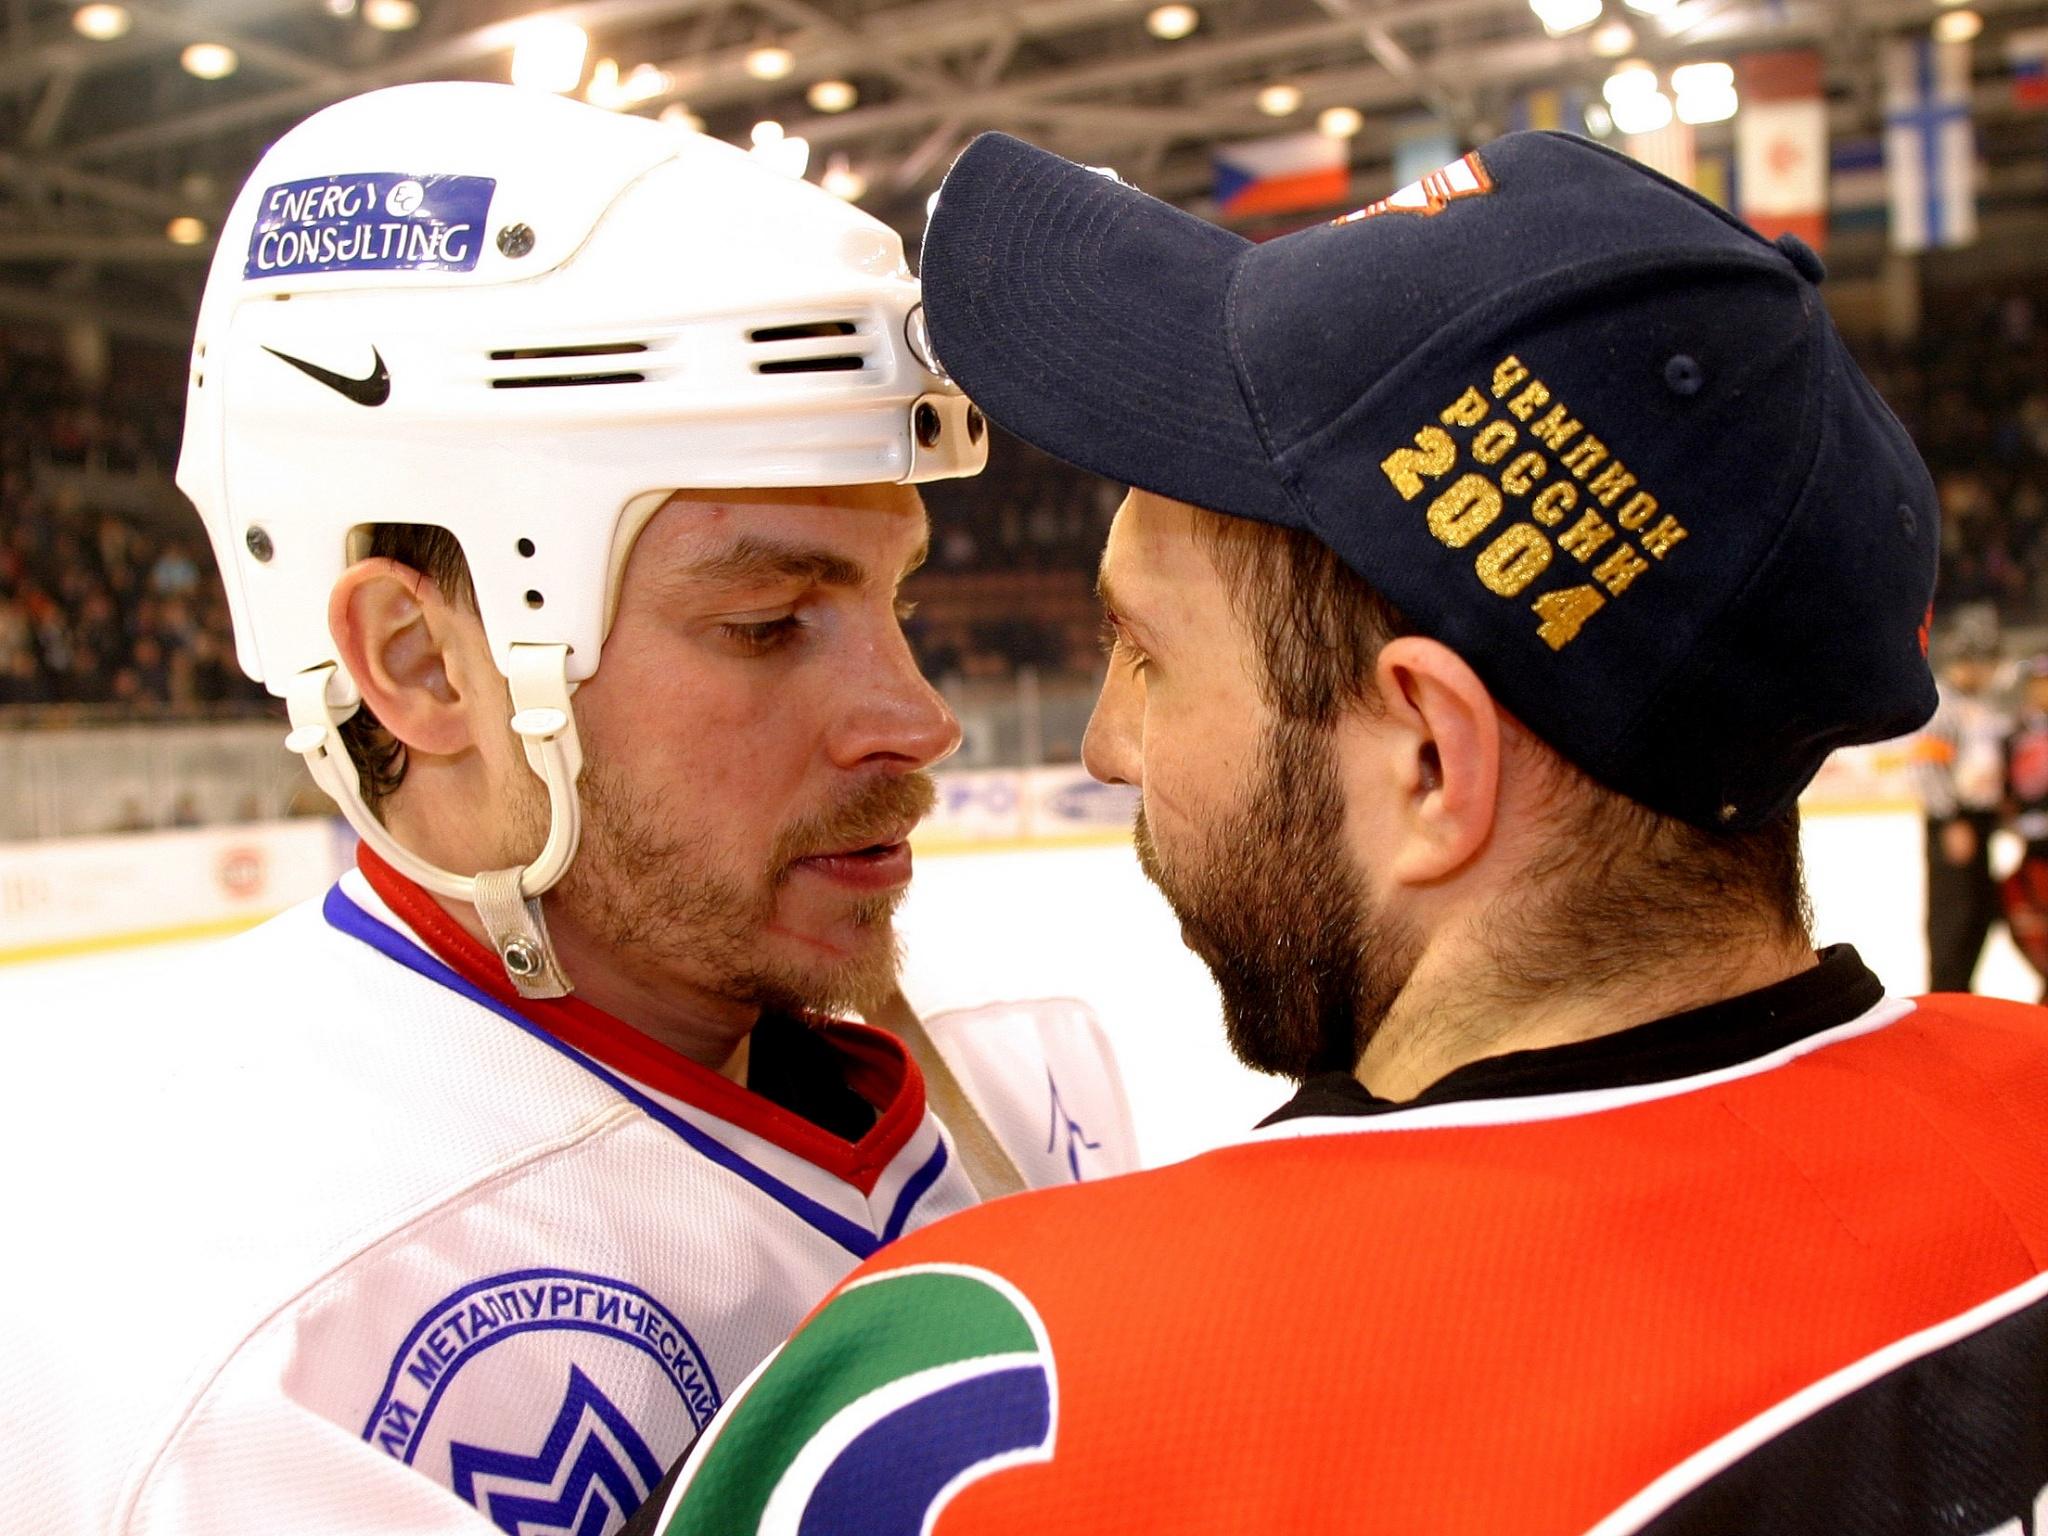 Валерий Карпов и Максим Сушинский. Фото: Владимир Беззубов